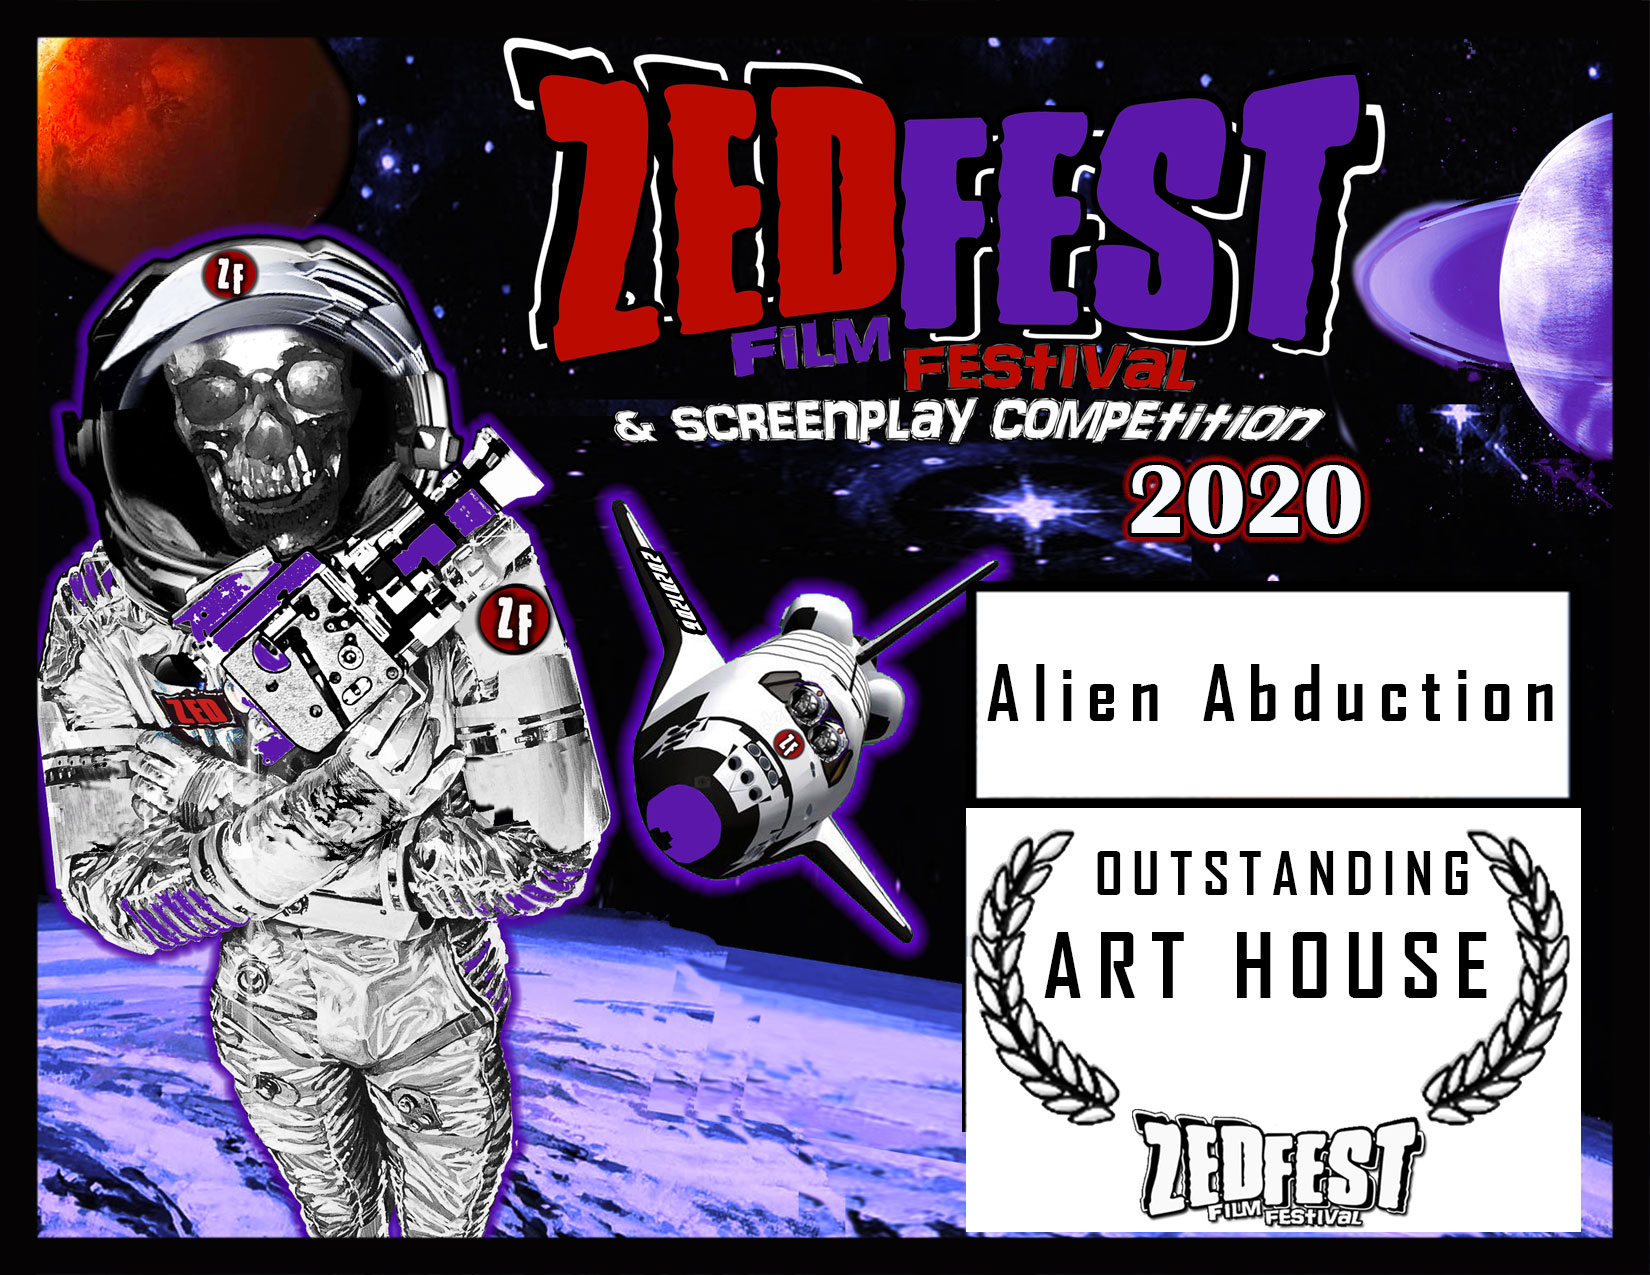 Zed Fest 2020 Alien Abduction ART HOUSE Award